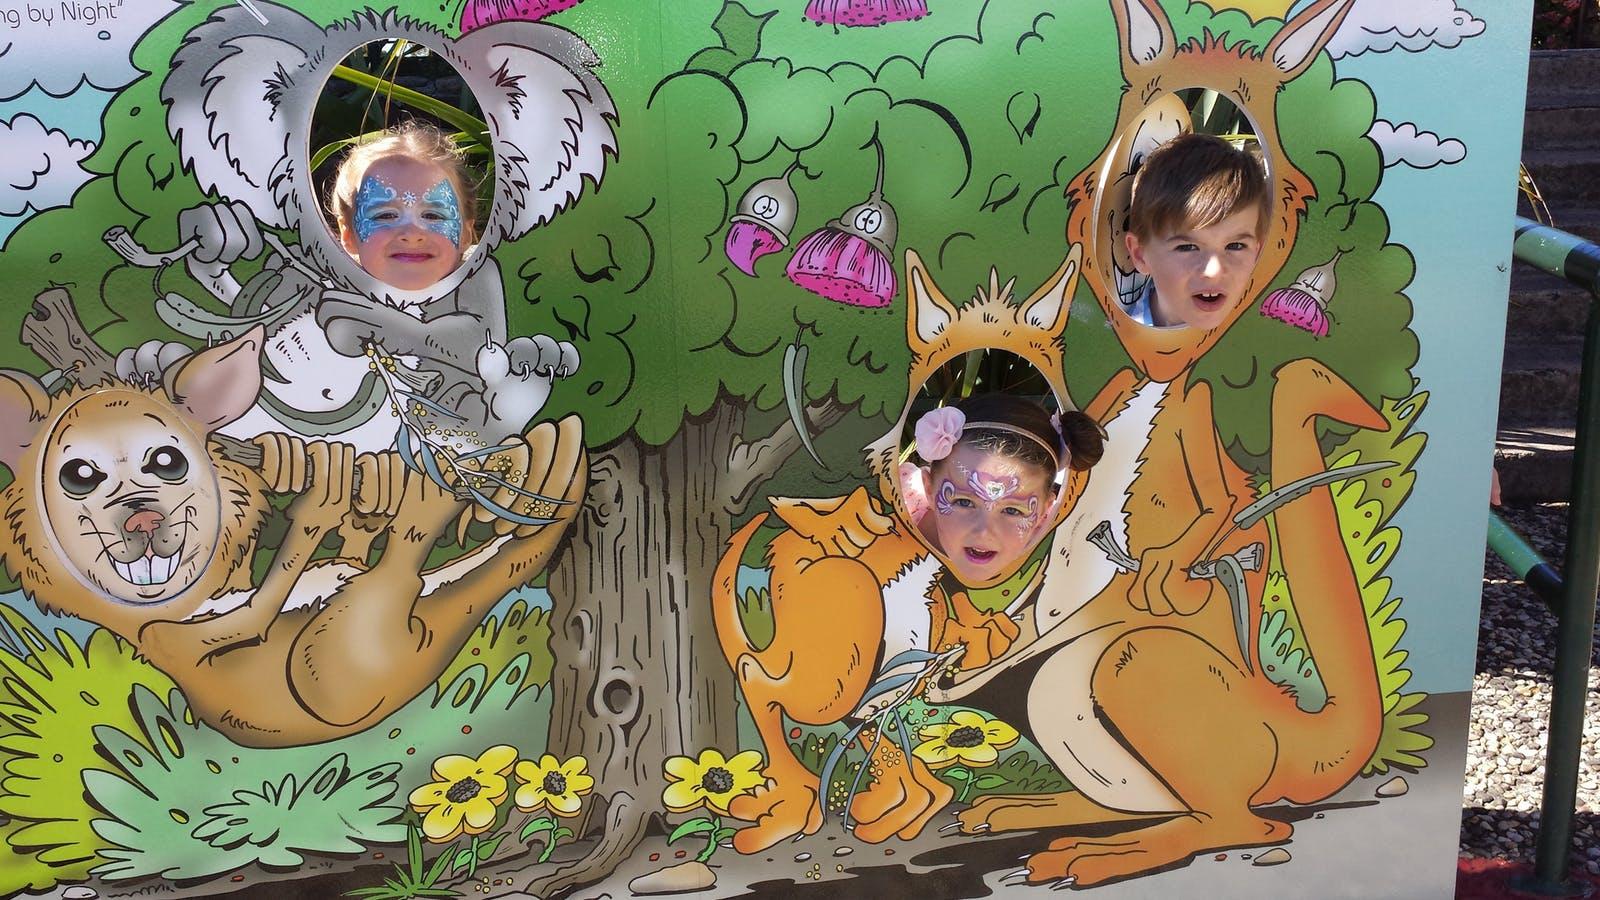 Children's fun and activities at SkyHigh